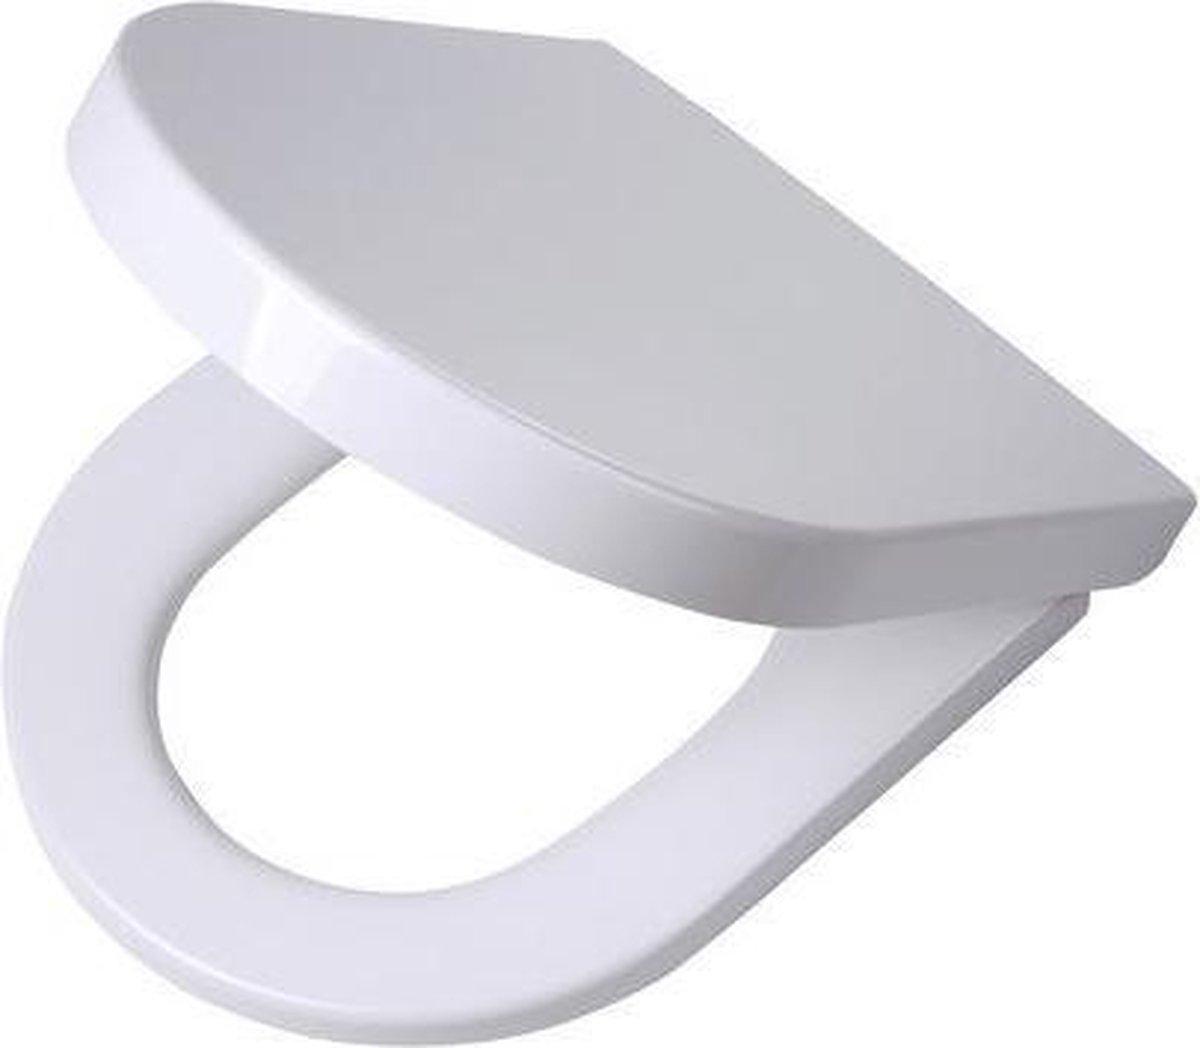 Tiger Memphis wc-bril - Duroplast - Afklikbaar - Wit